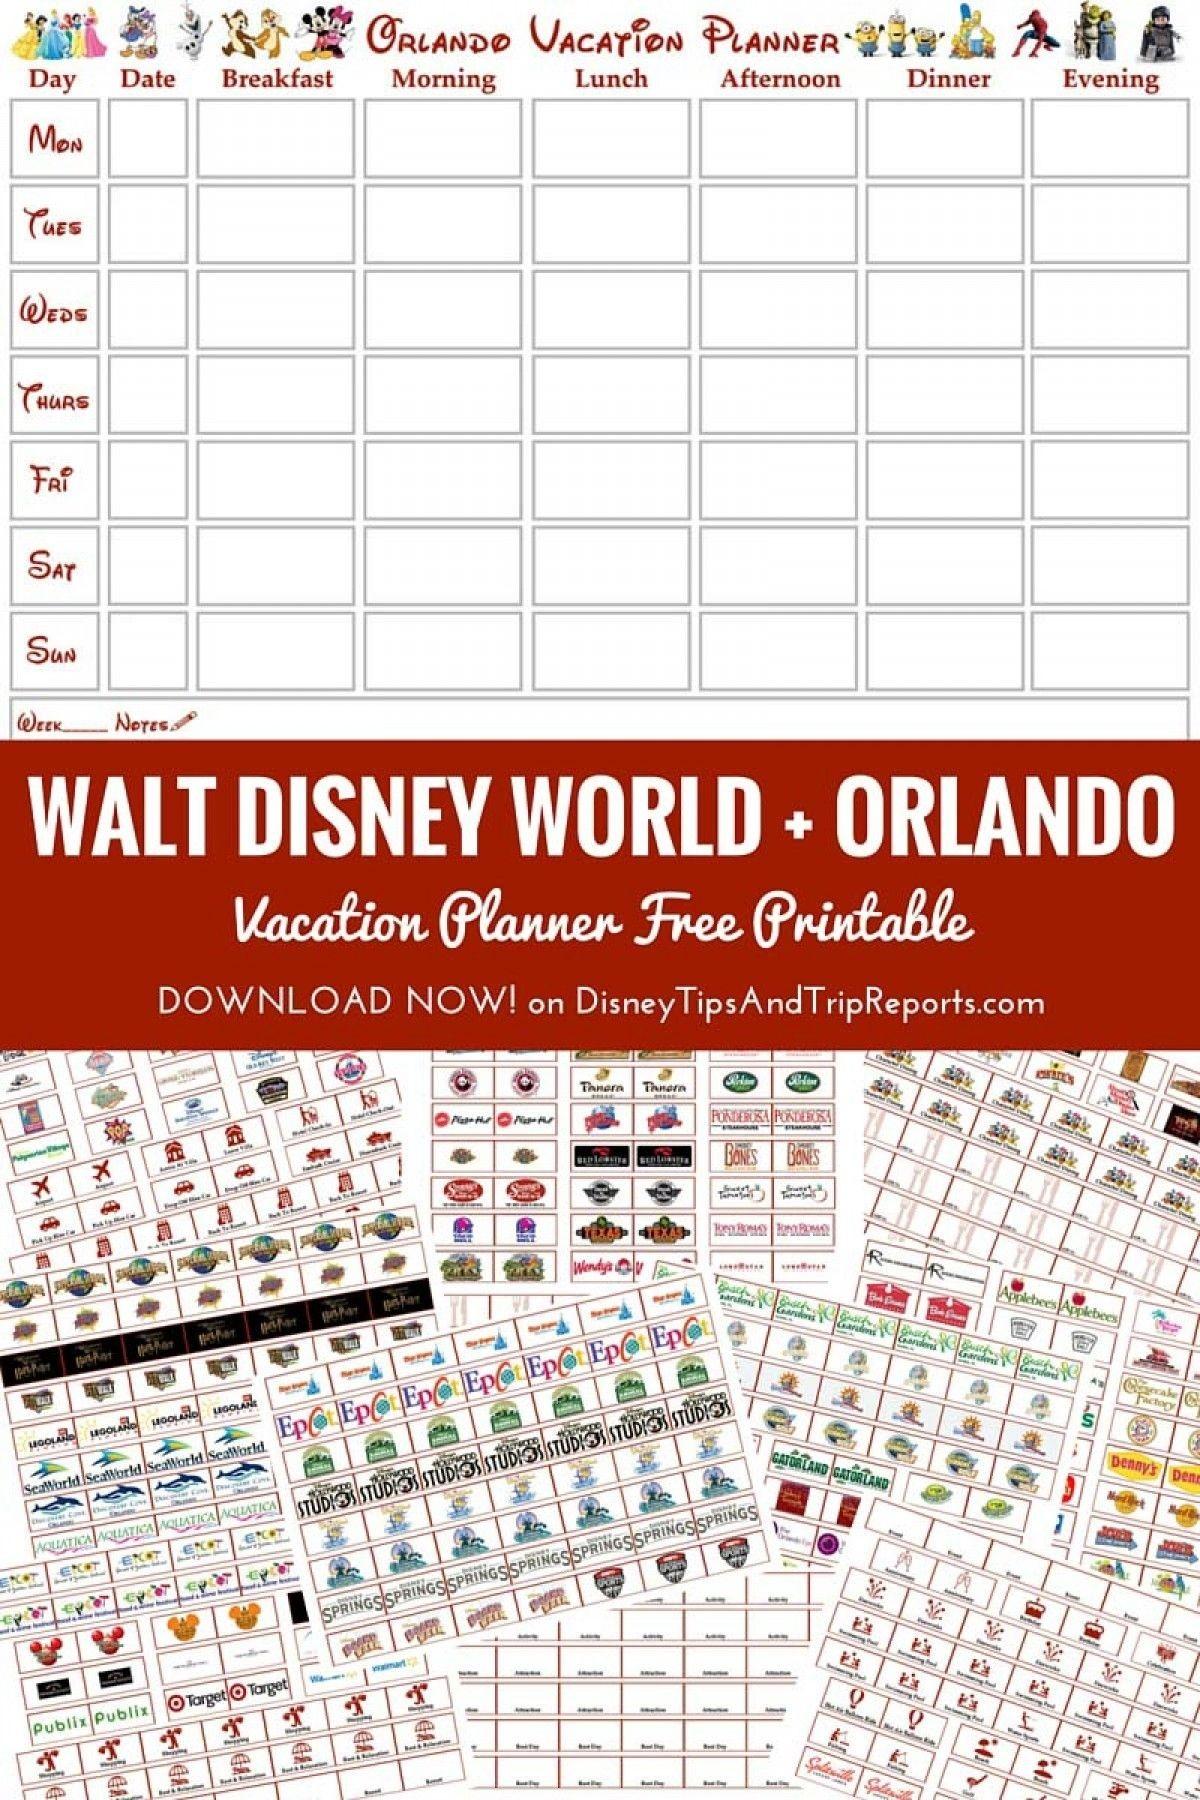 Free Printable Walt Disney World + Orlando Vacation Planner-Disney Week Blank Itinerary